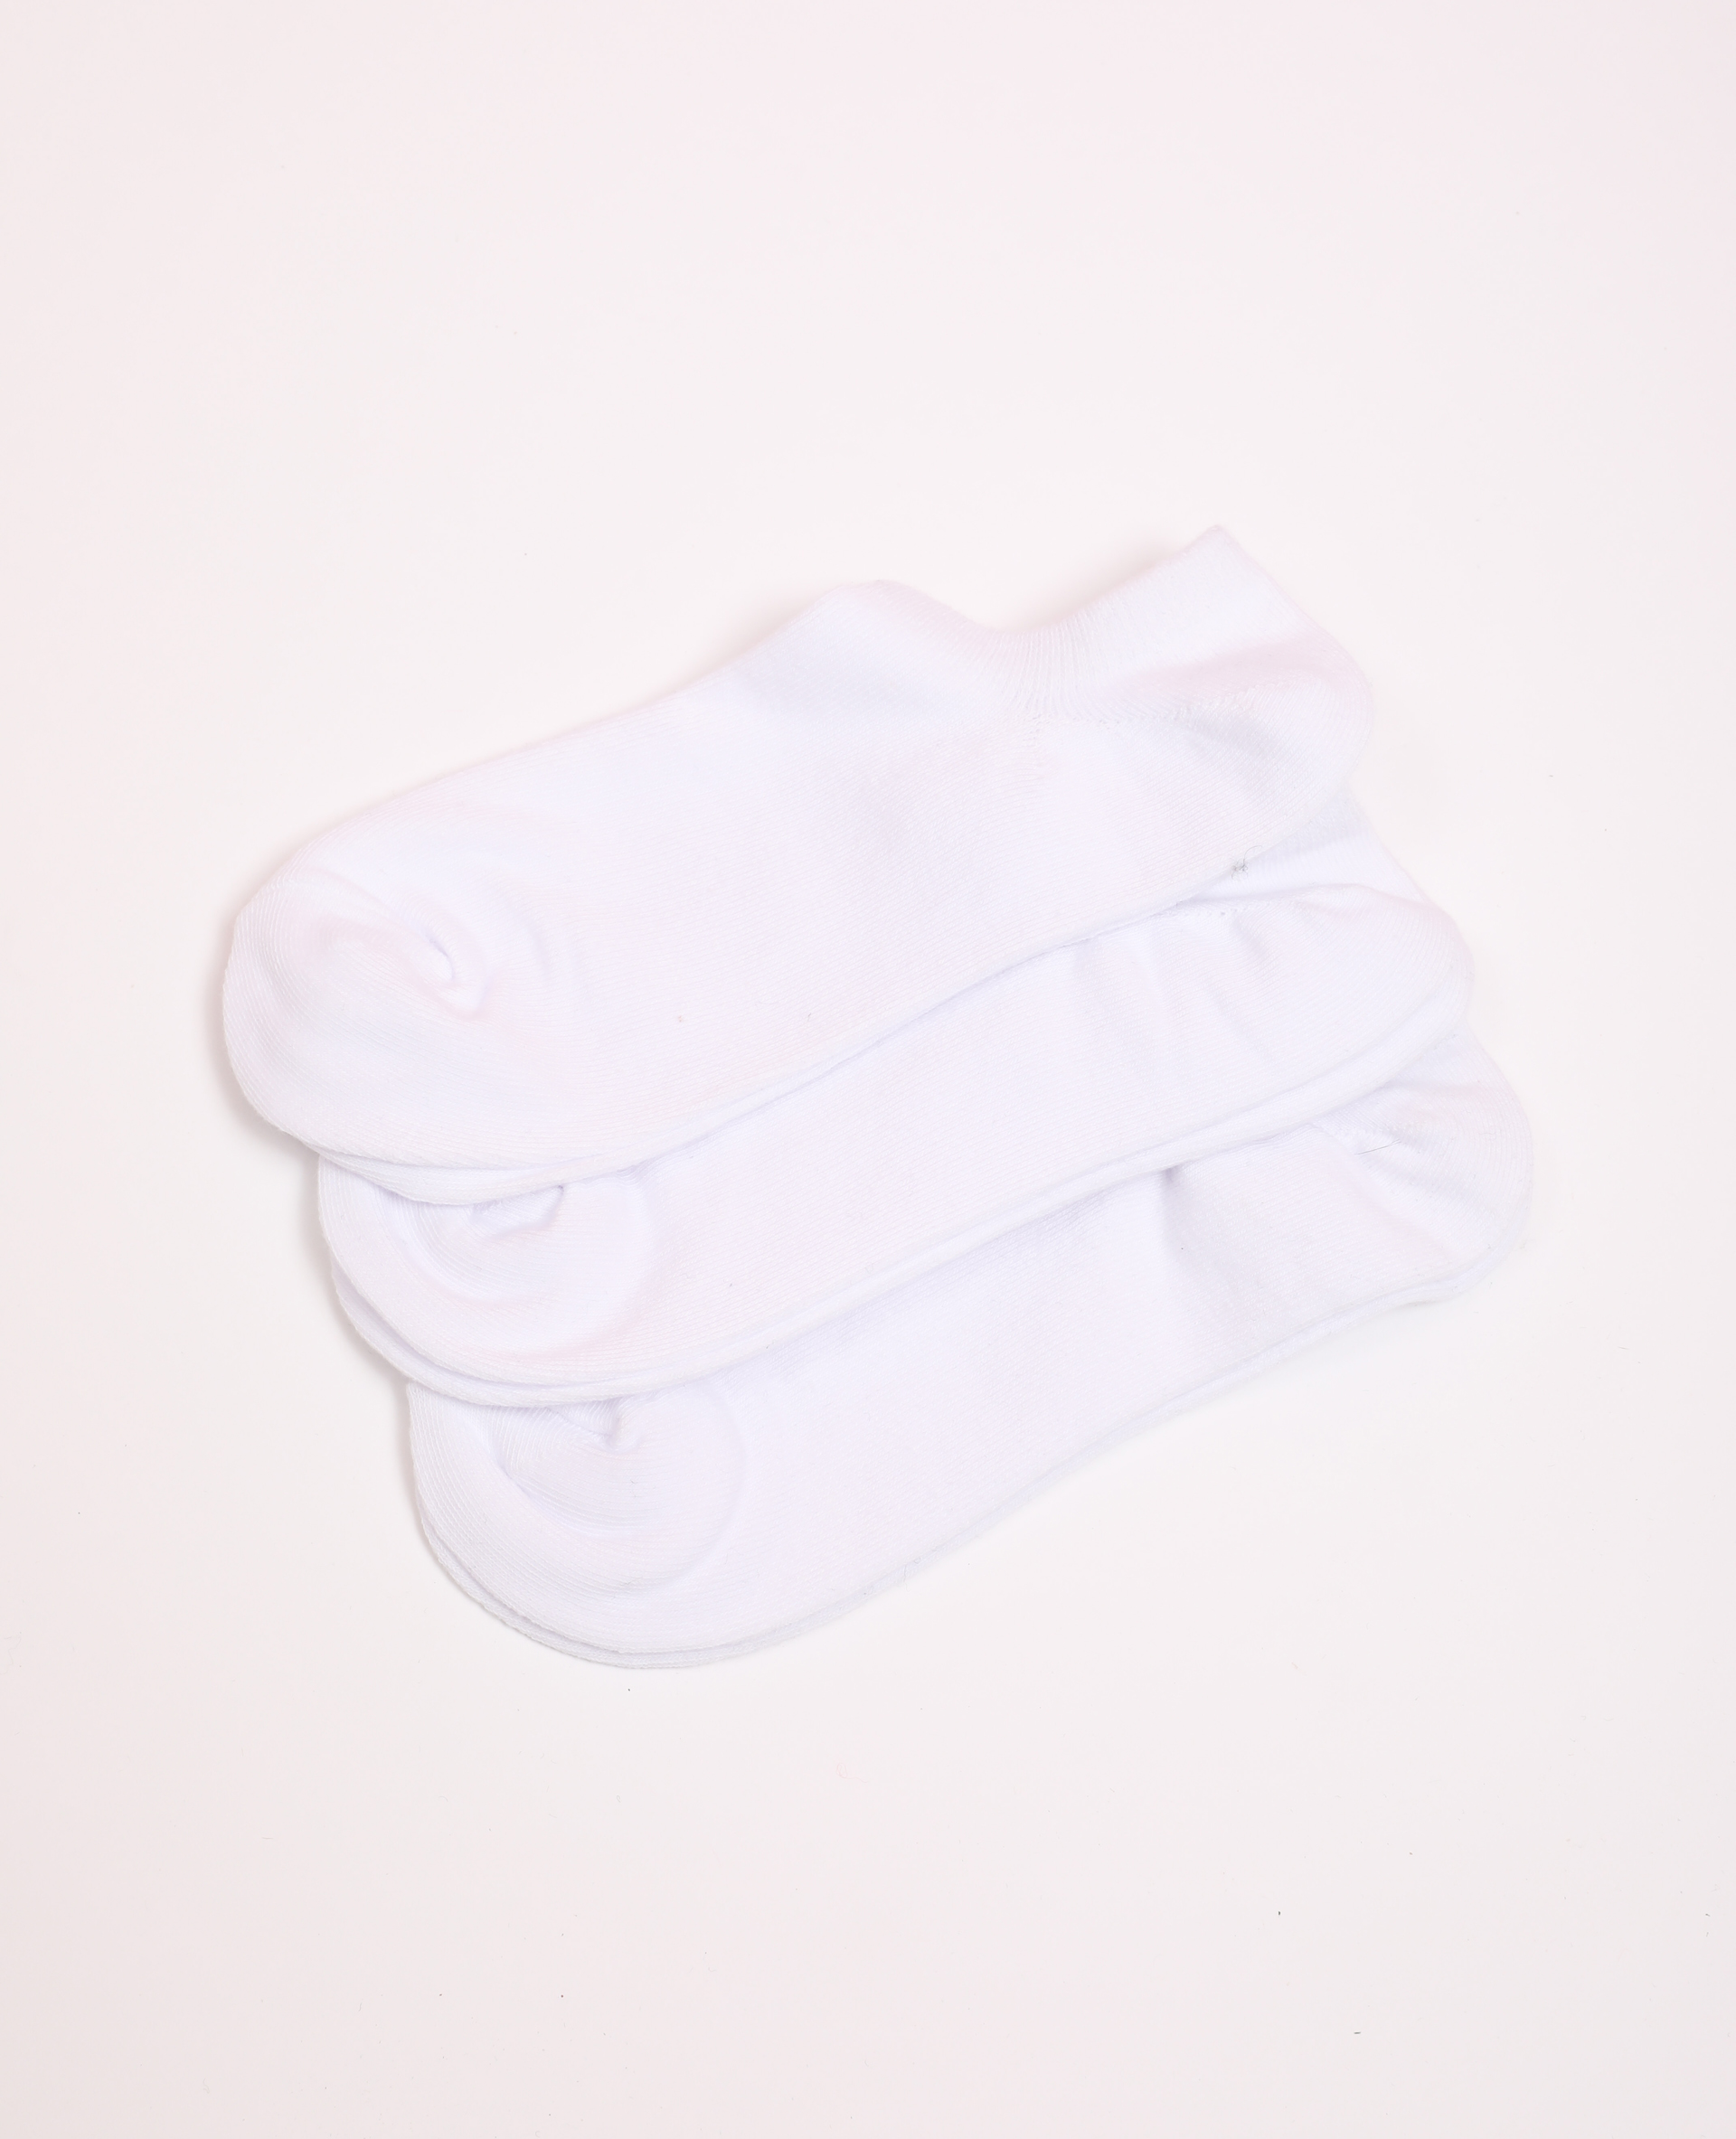 Lotto di calzini bassi bianco - Pimkie